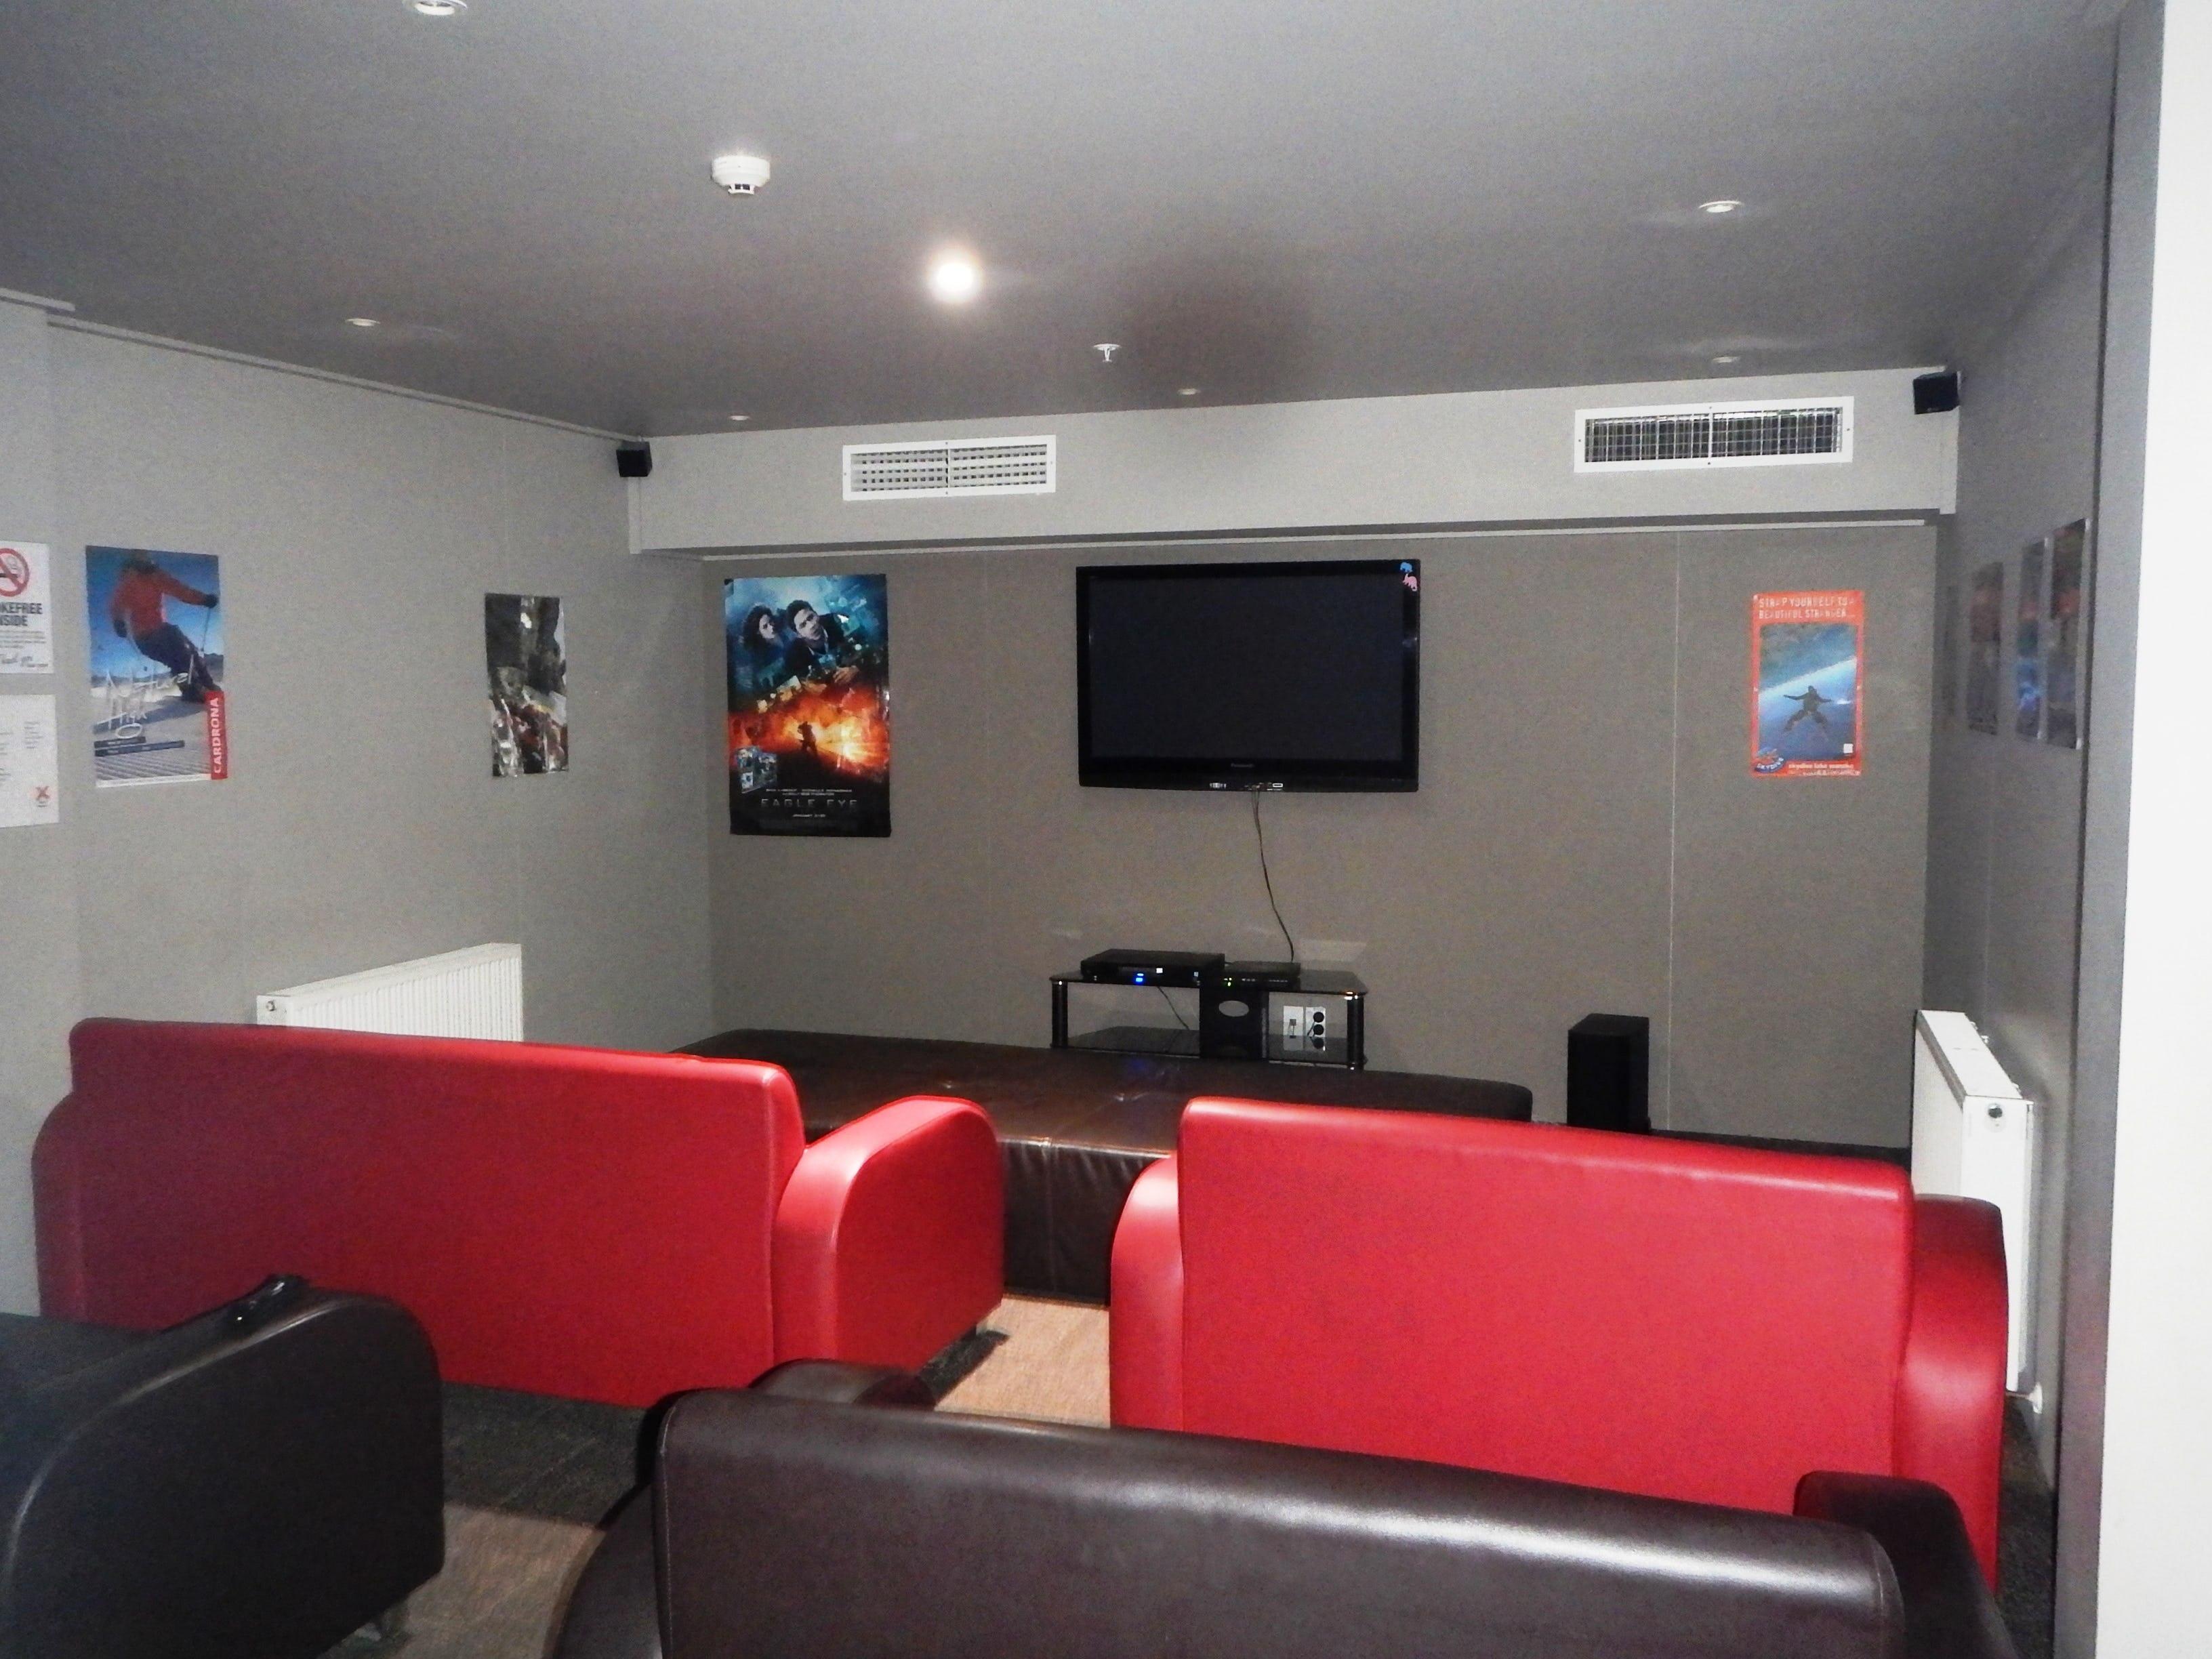 Base瓦纳卡背包客旅馆的影视房